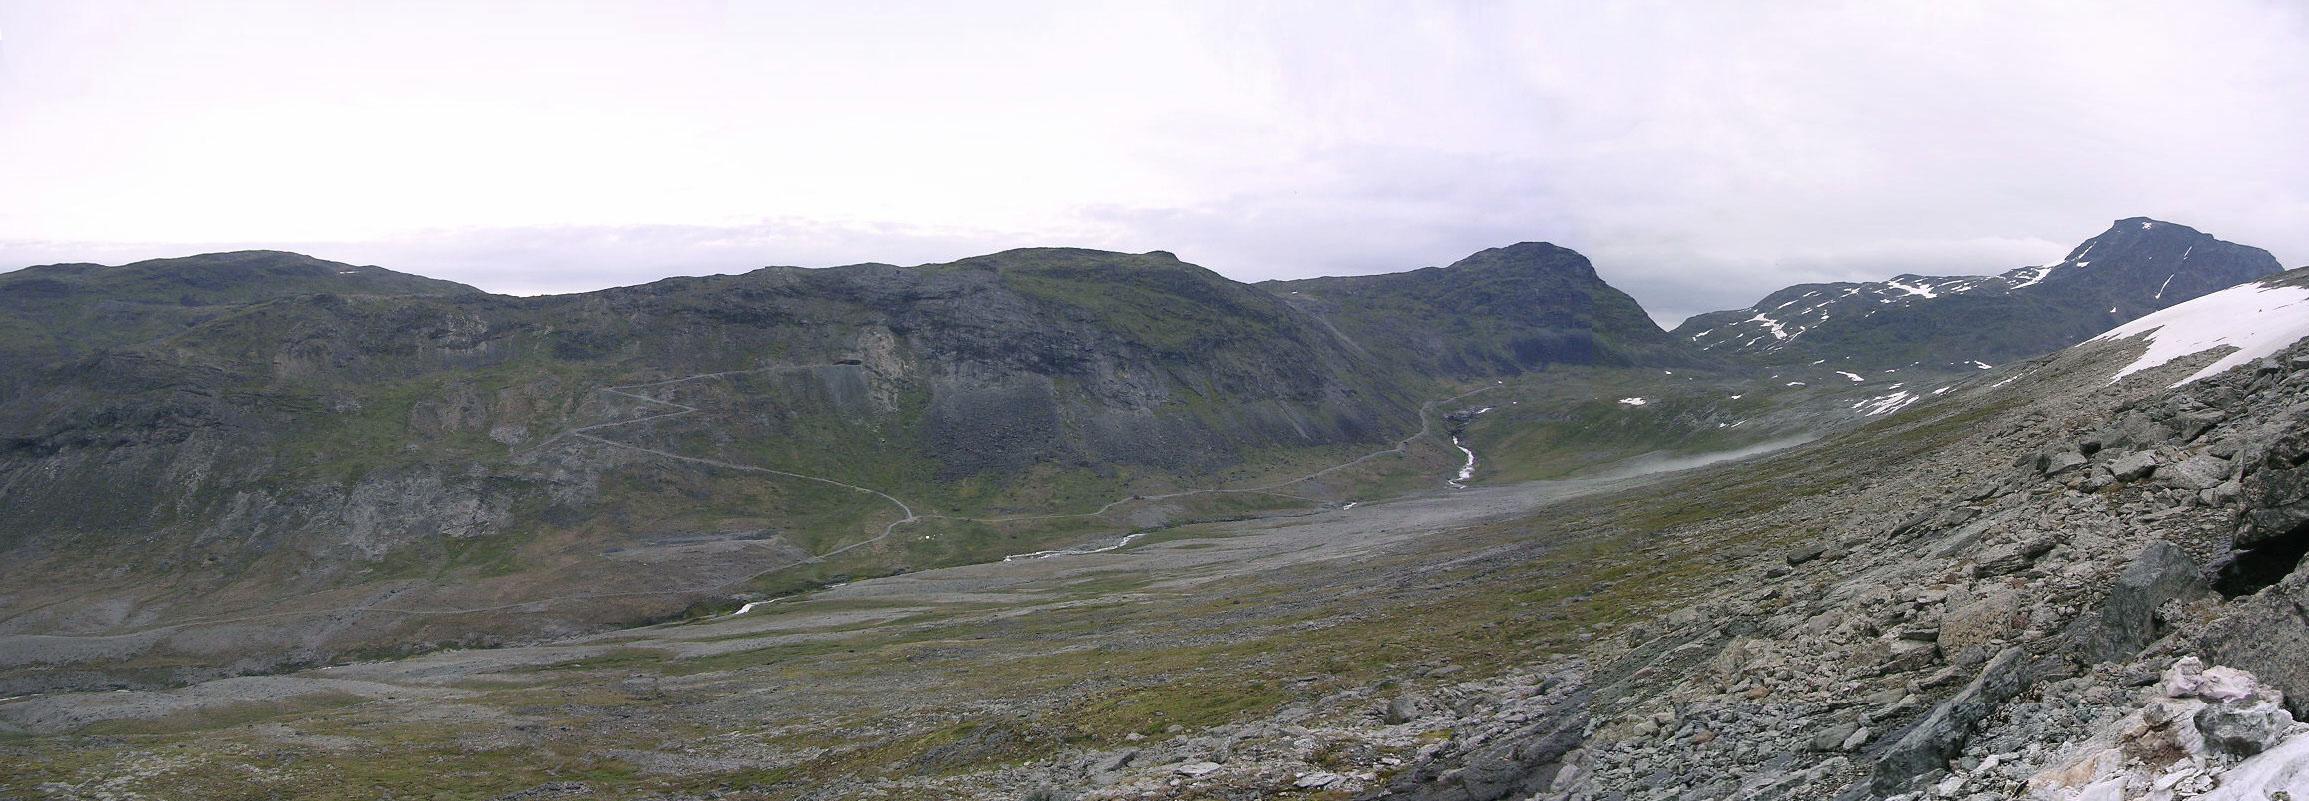 Panoramic View From Kvanefjeld To Taseq West